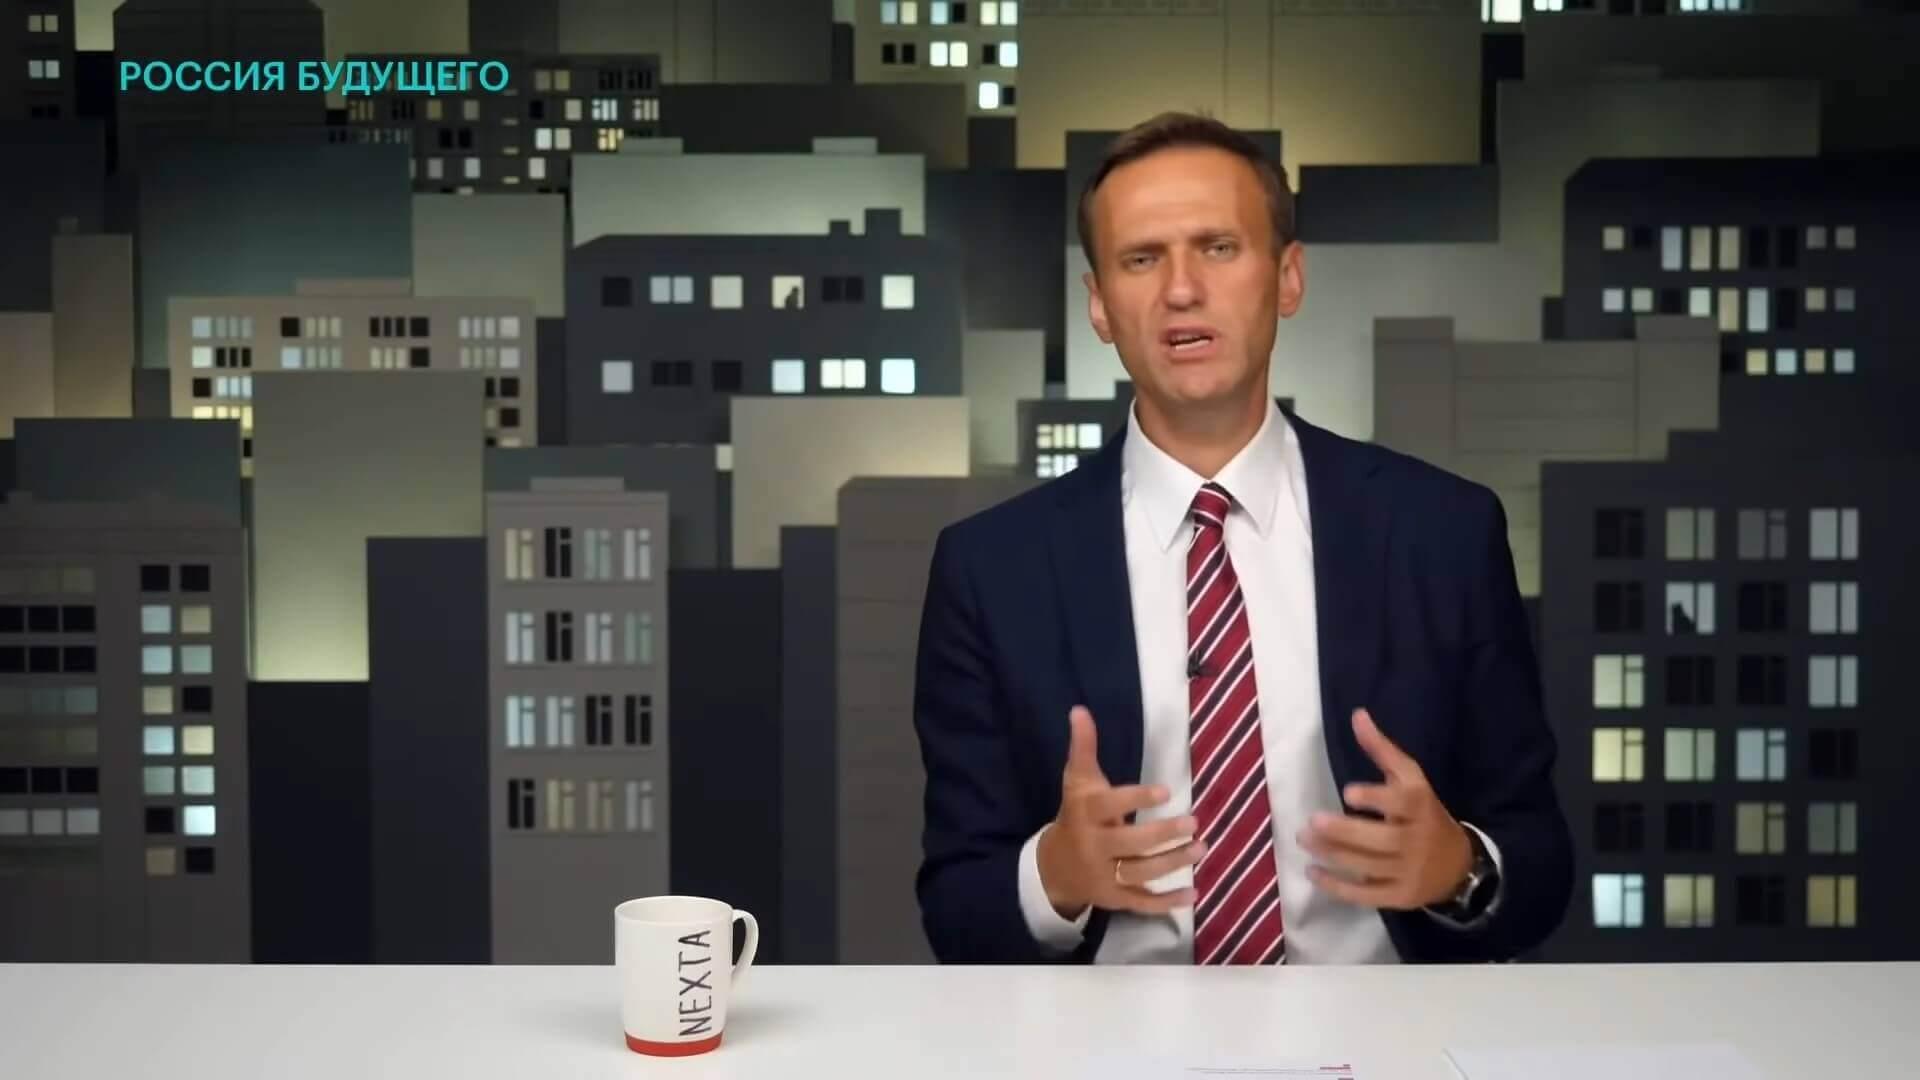 Youtube / Навальный LIVE